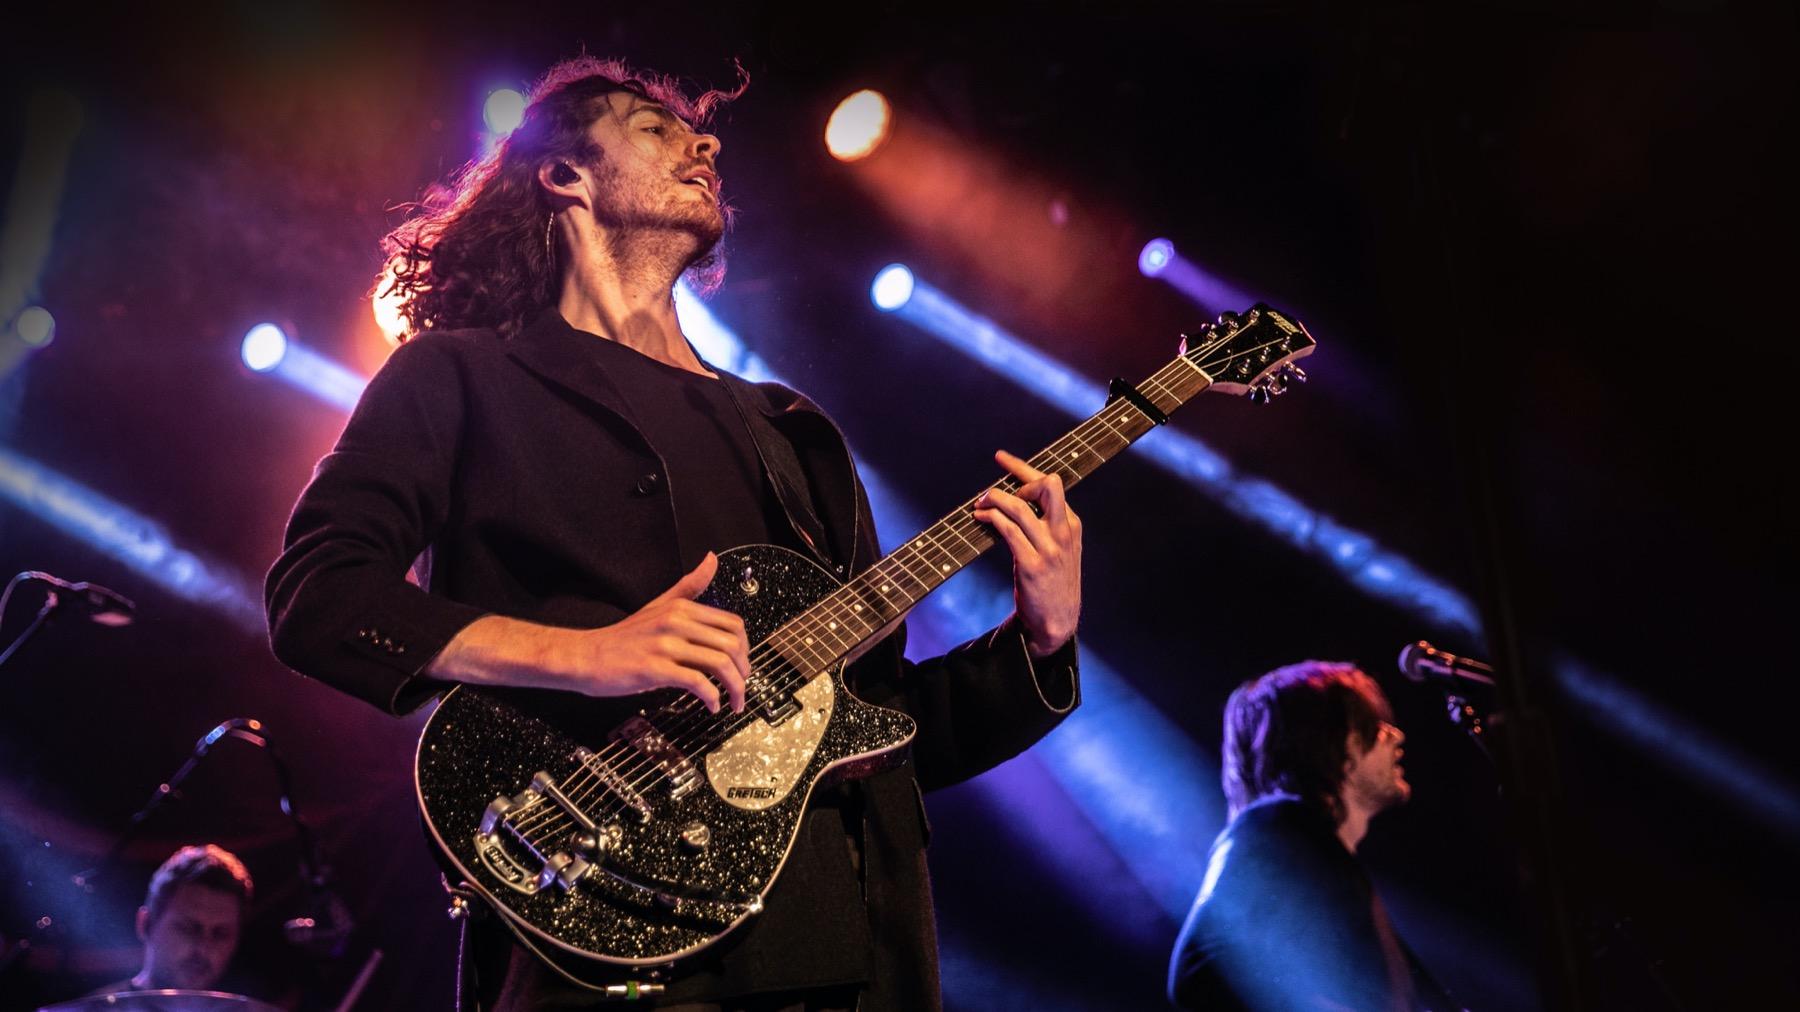 Hozier: Wasteland, Baby! Tour in Chicago